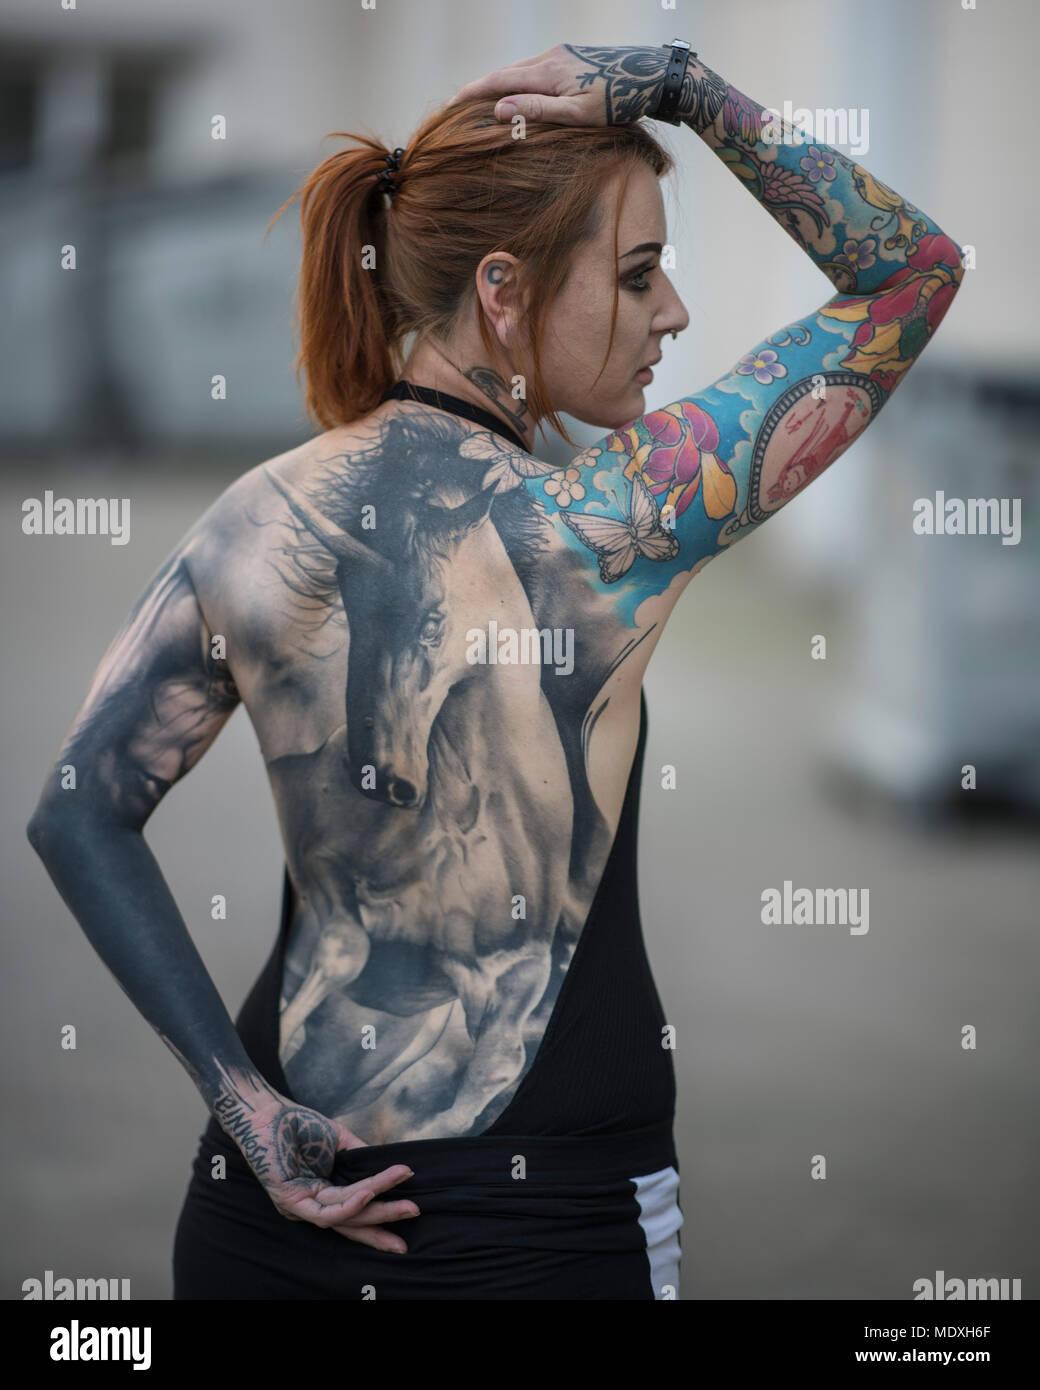 francfort, allemagne. 21 avril 2018. une femme présente son dos